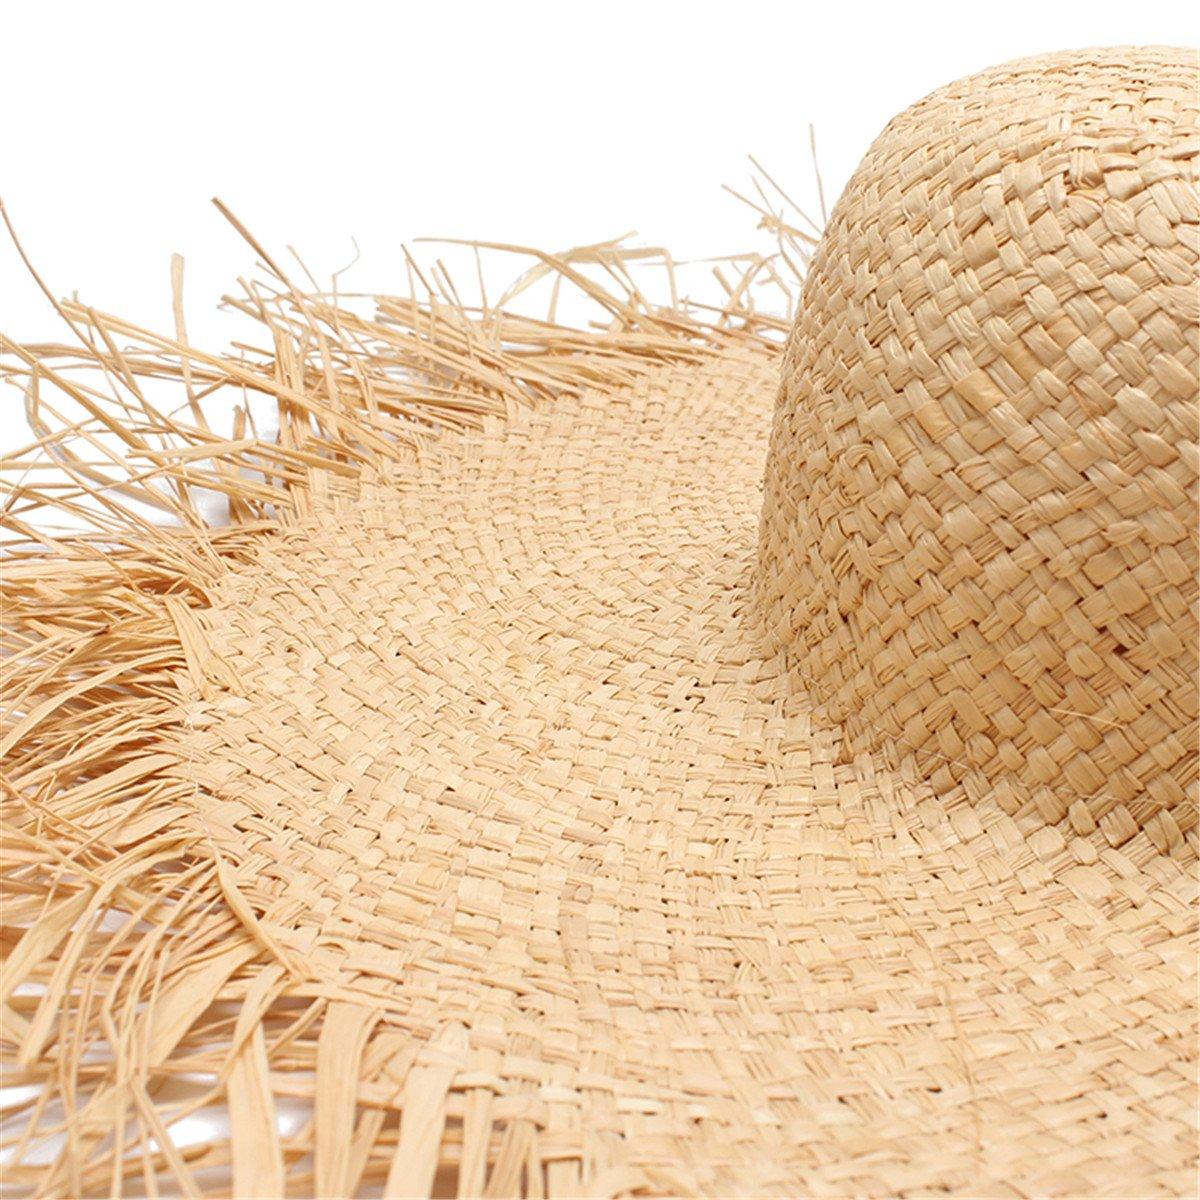 79f24678f4d49 Women Summer Sun Hat with A Large Brim Ladies Raffia Straw Hat Fringe Big  Beach Hats for Holiday  Amazon.co.uk  Clothing